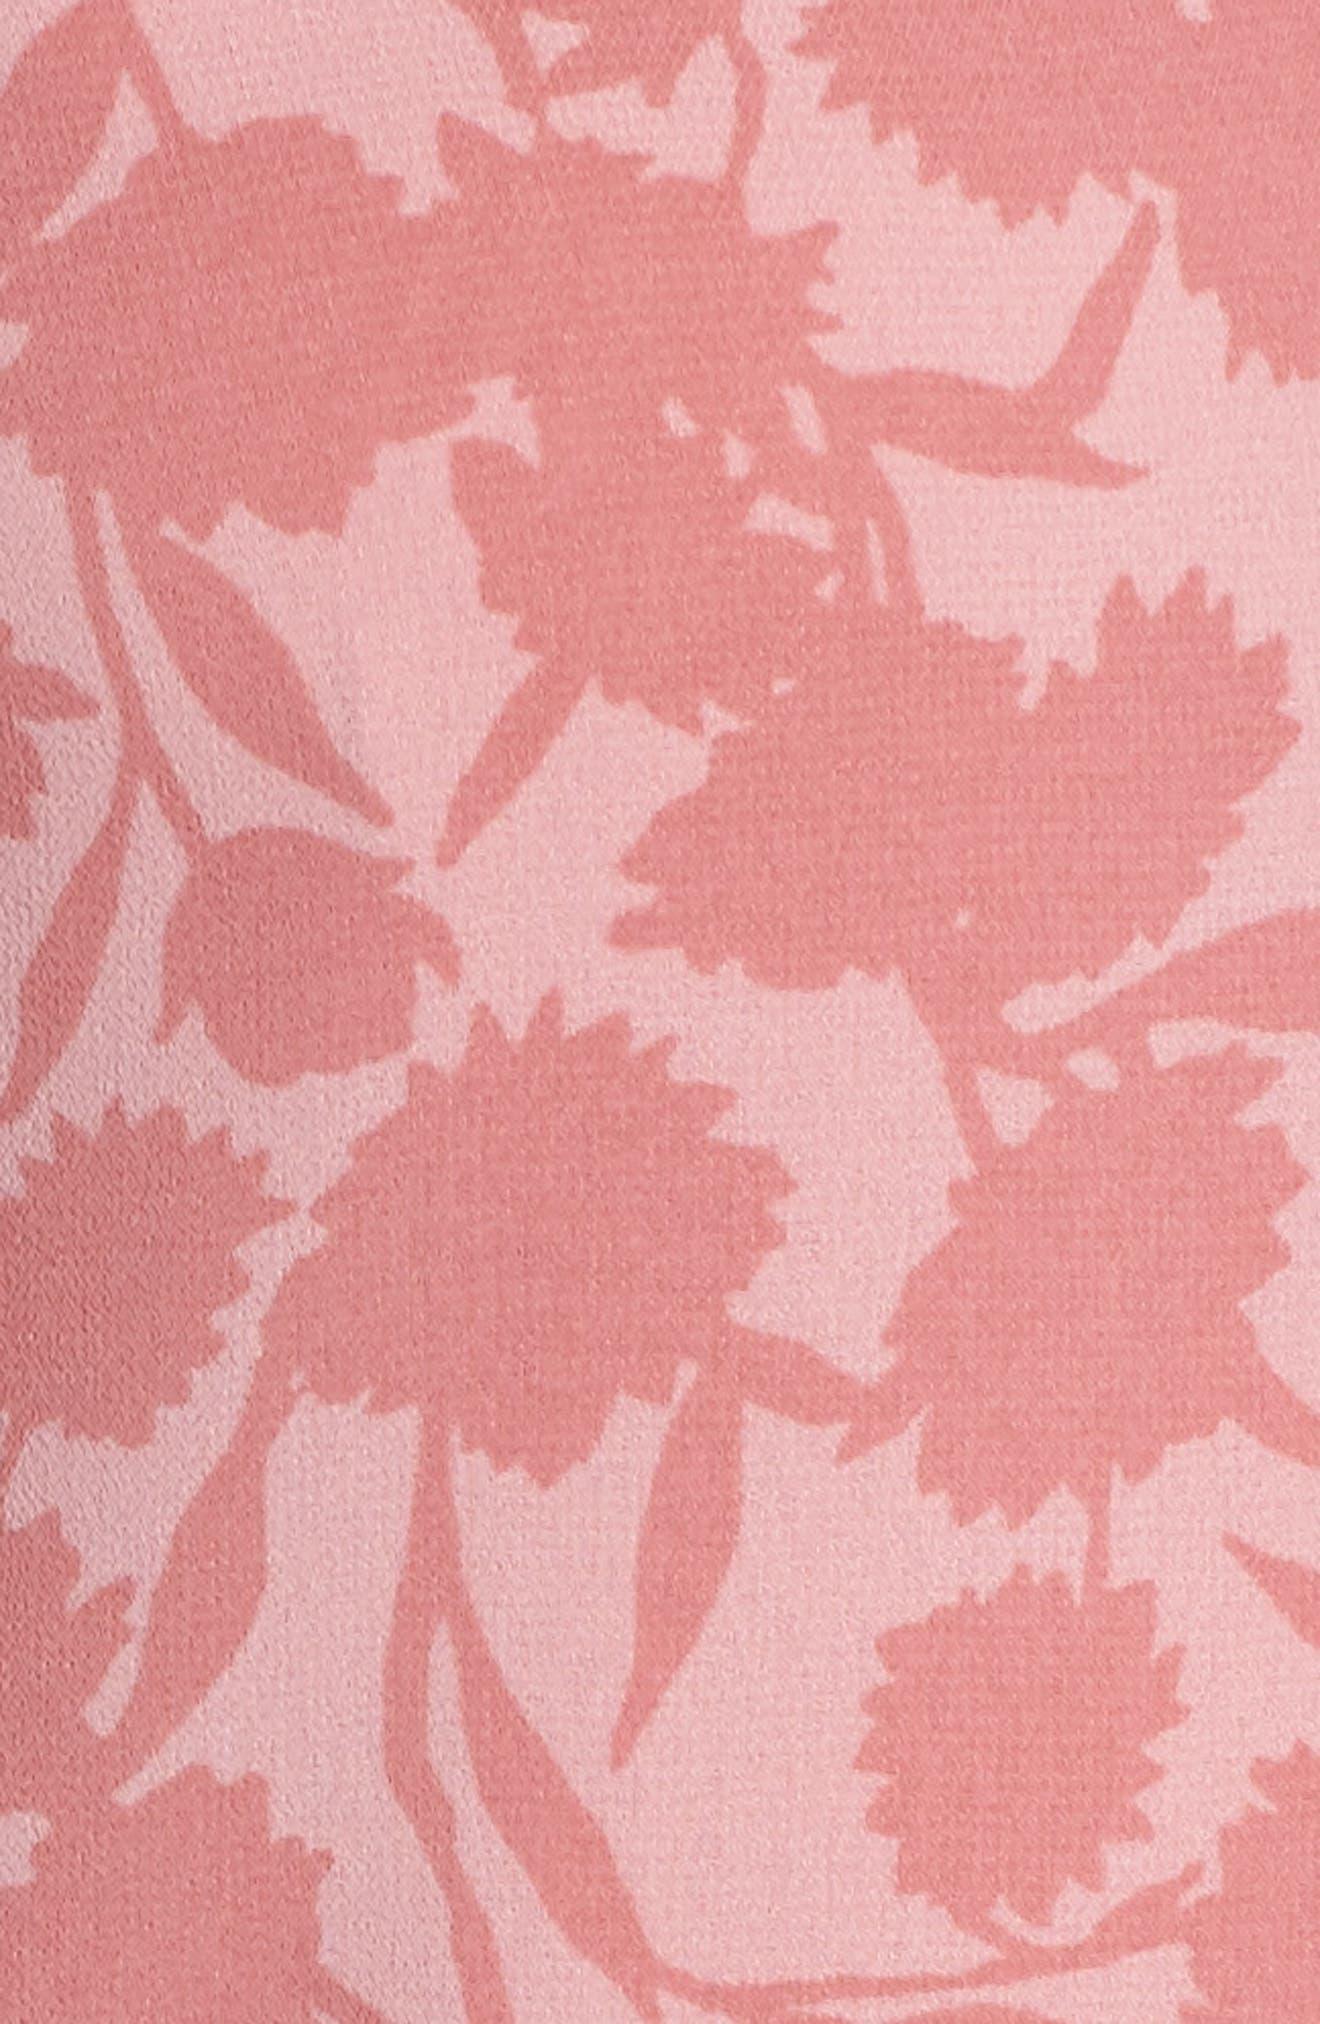 Esther Shadow Branch Chiffon Dress,                             Alternate thumbnail 6, color,                             690